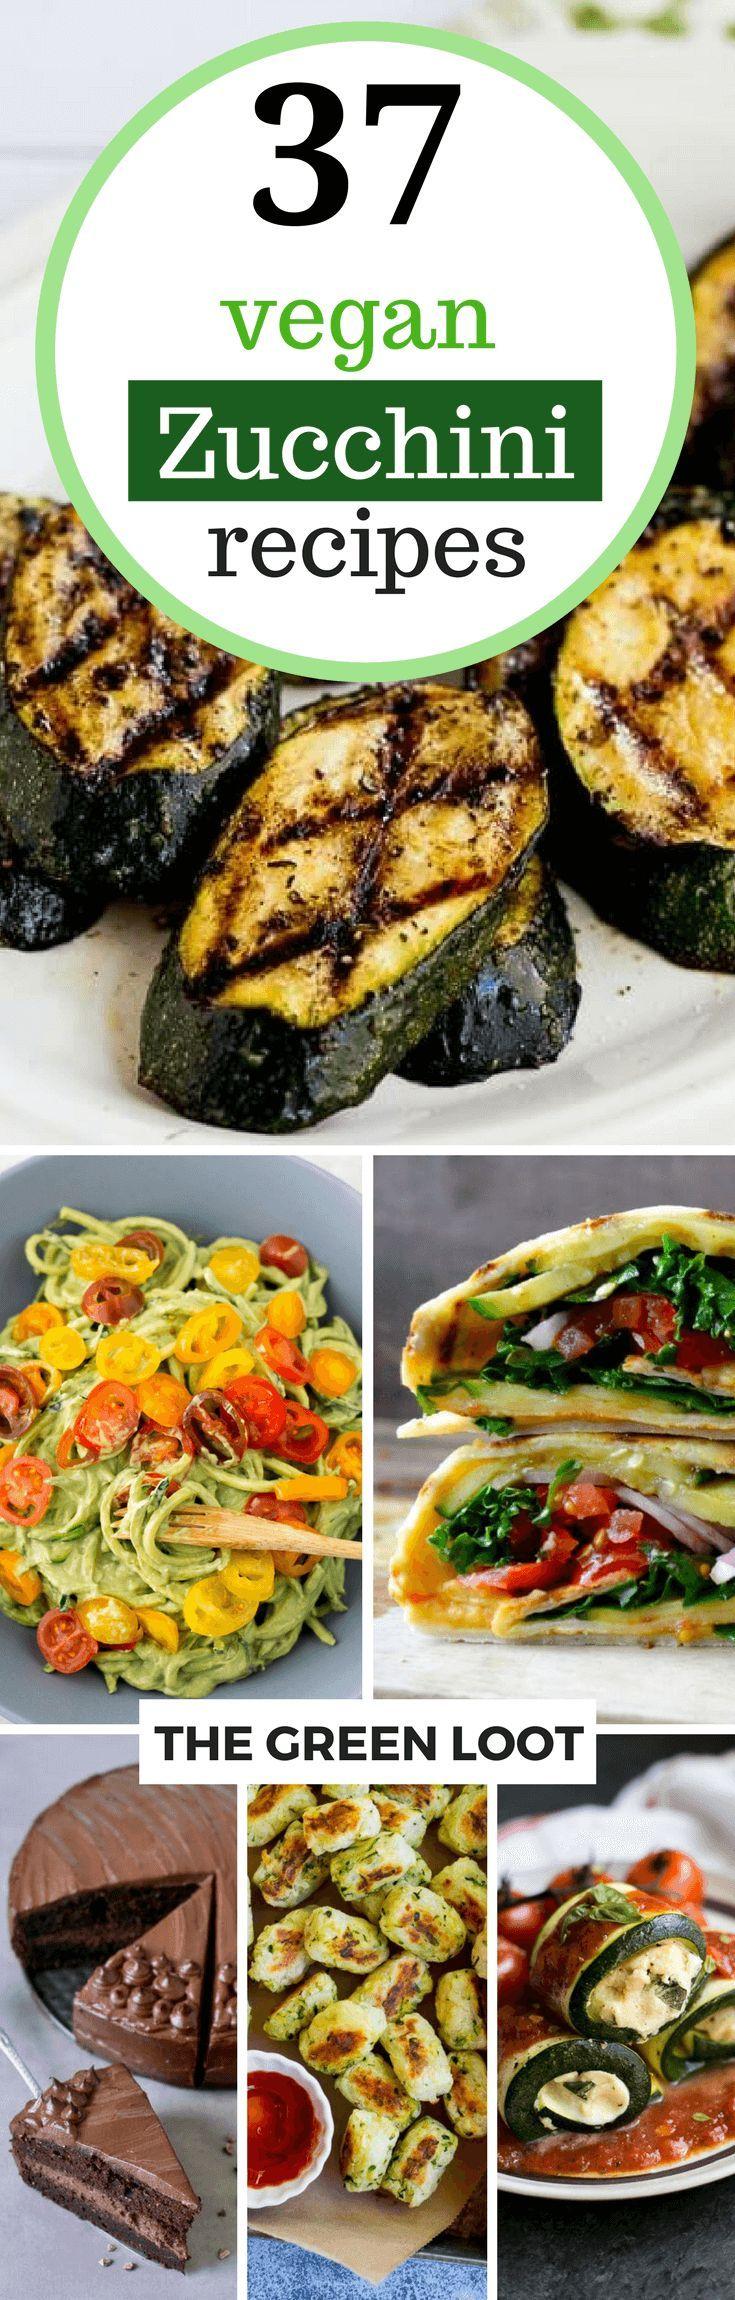 37 Healthy Vegan Zucchini Recipes For Dinner Vegan Zucchini Recipes Whole Food Recipes Vegaterian Recipes